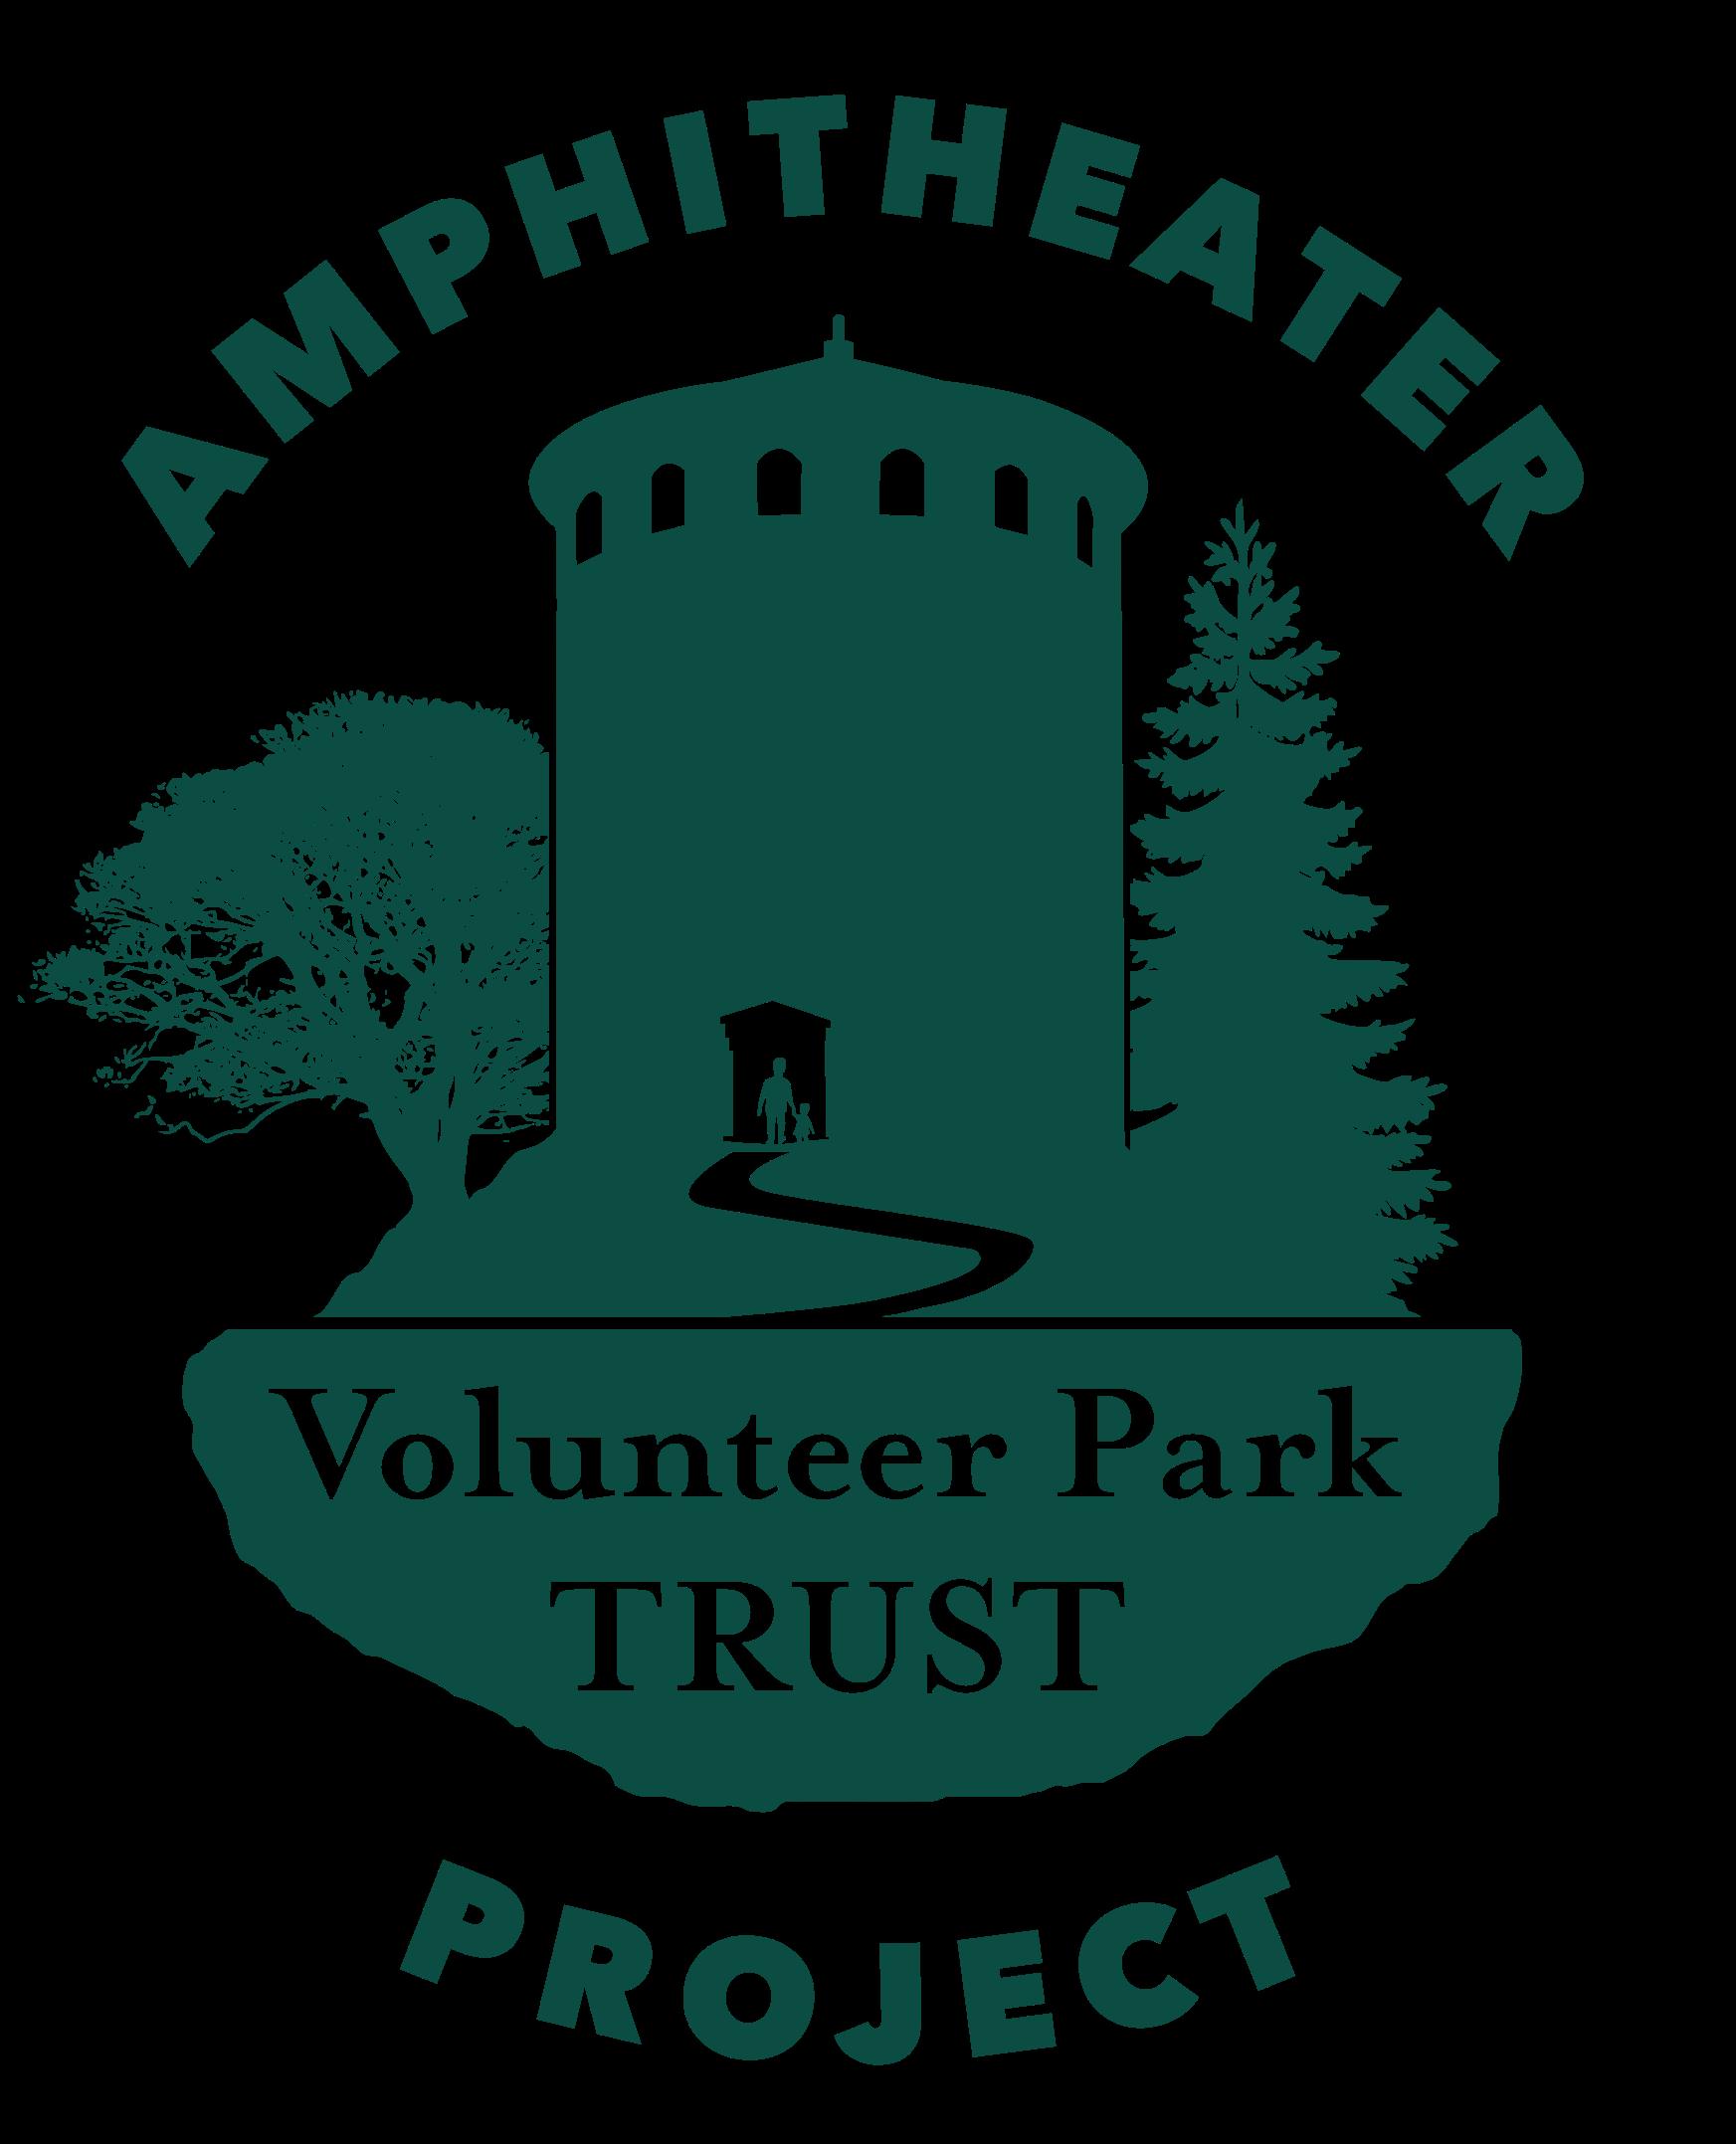 Amphitheater Project logo